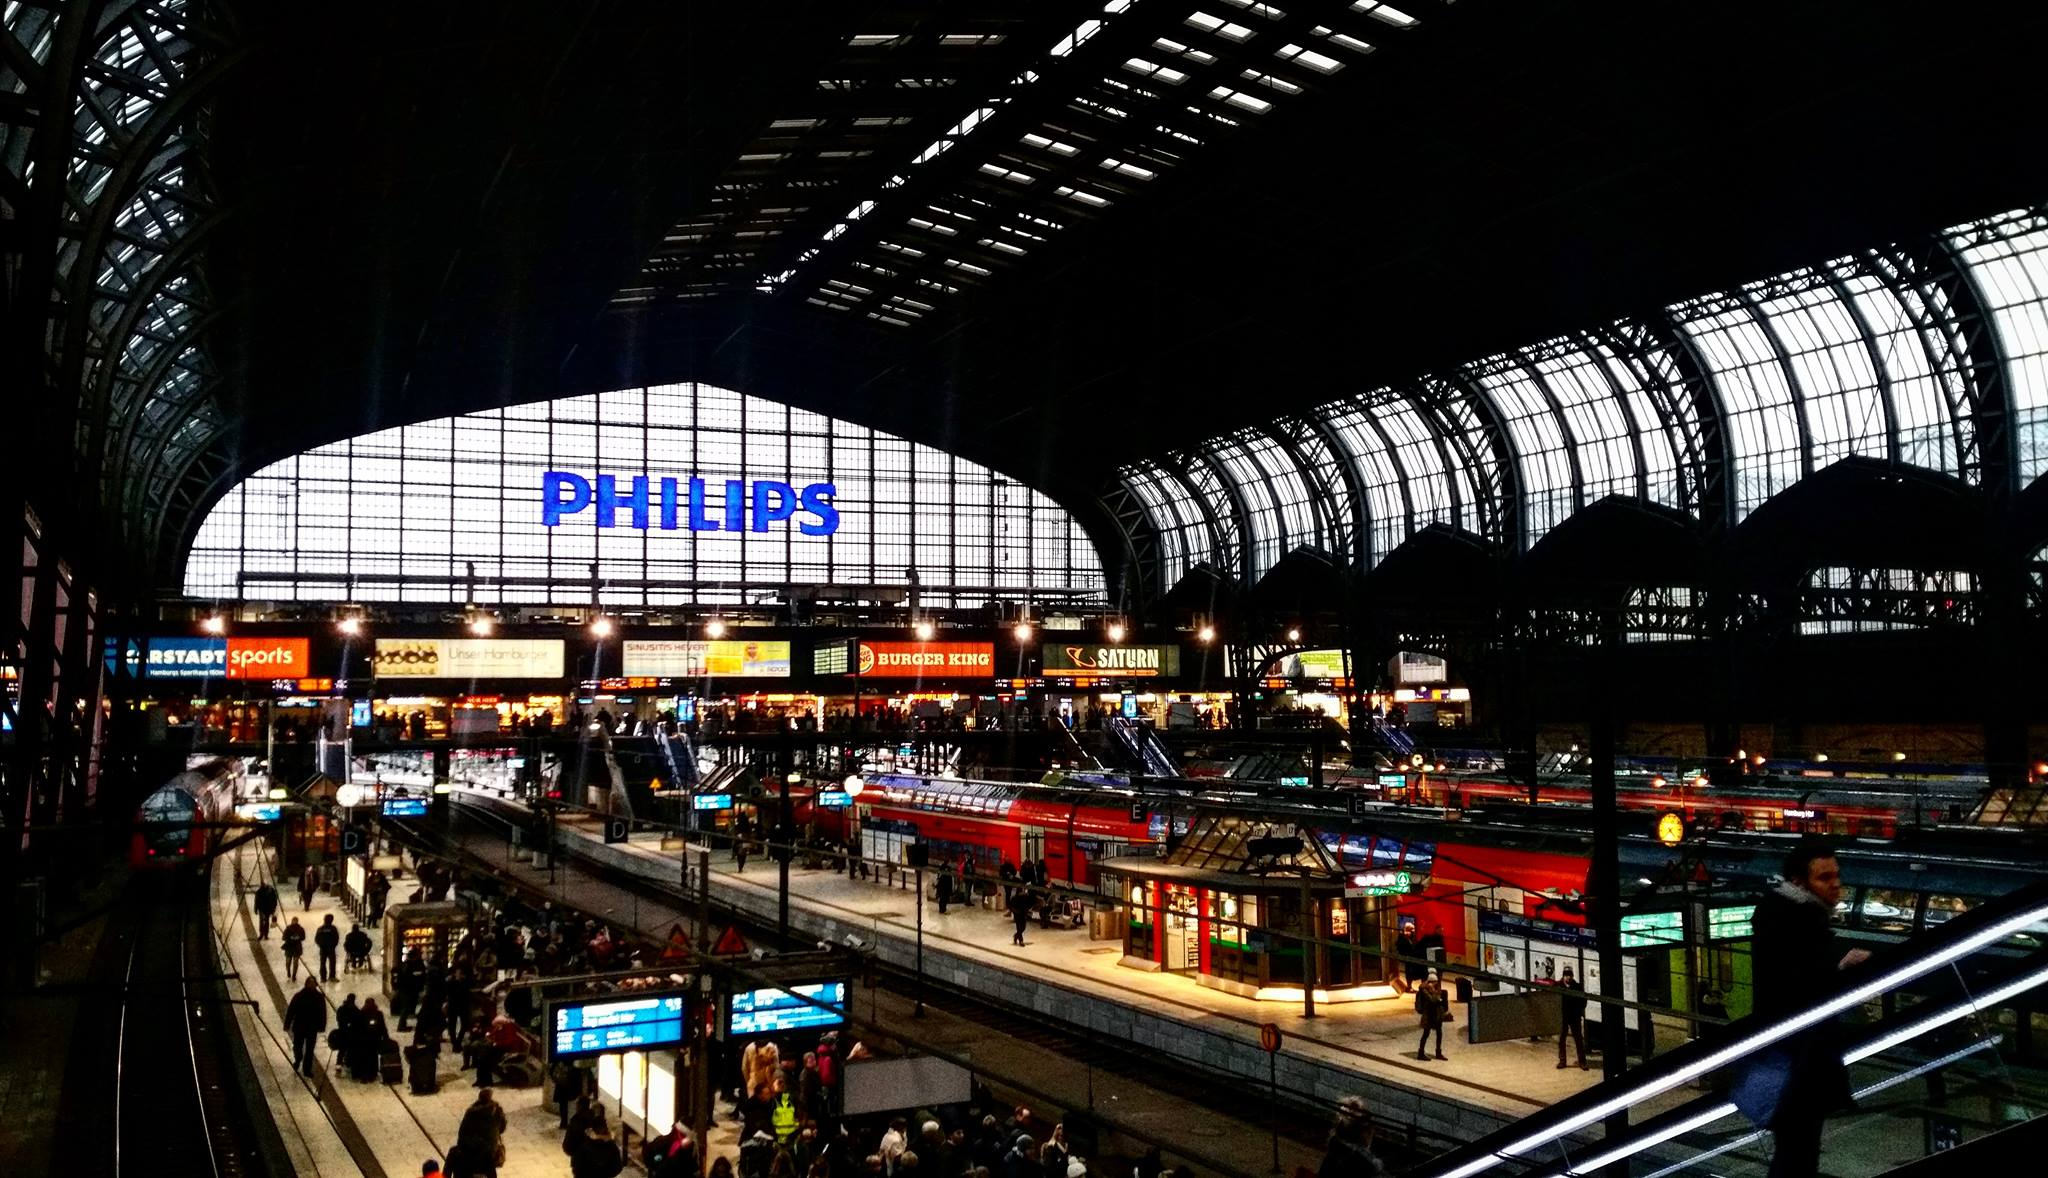 angelapark-hamburgbahnhof_studyinfocalpoints